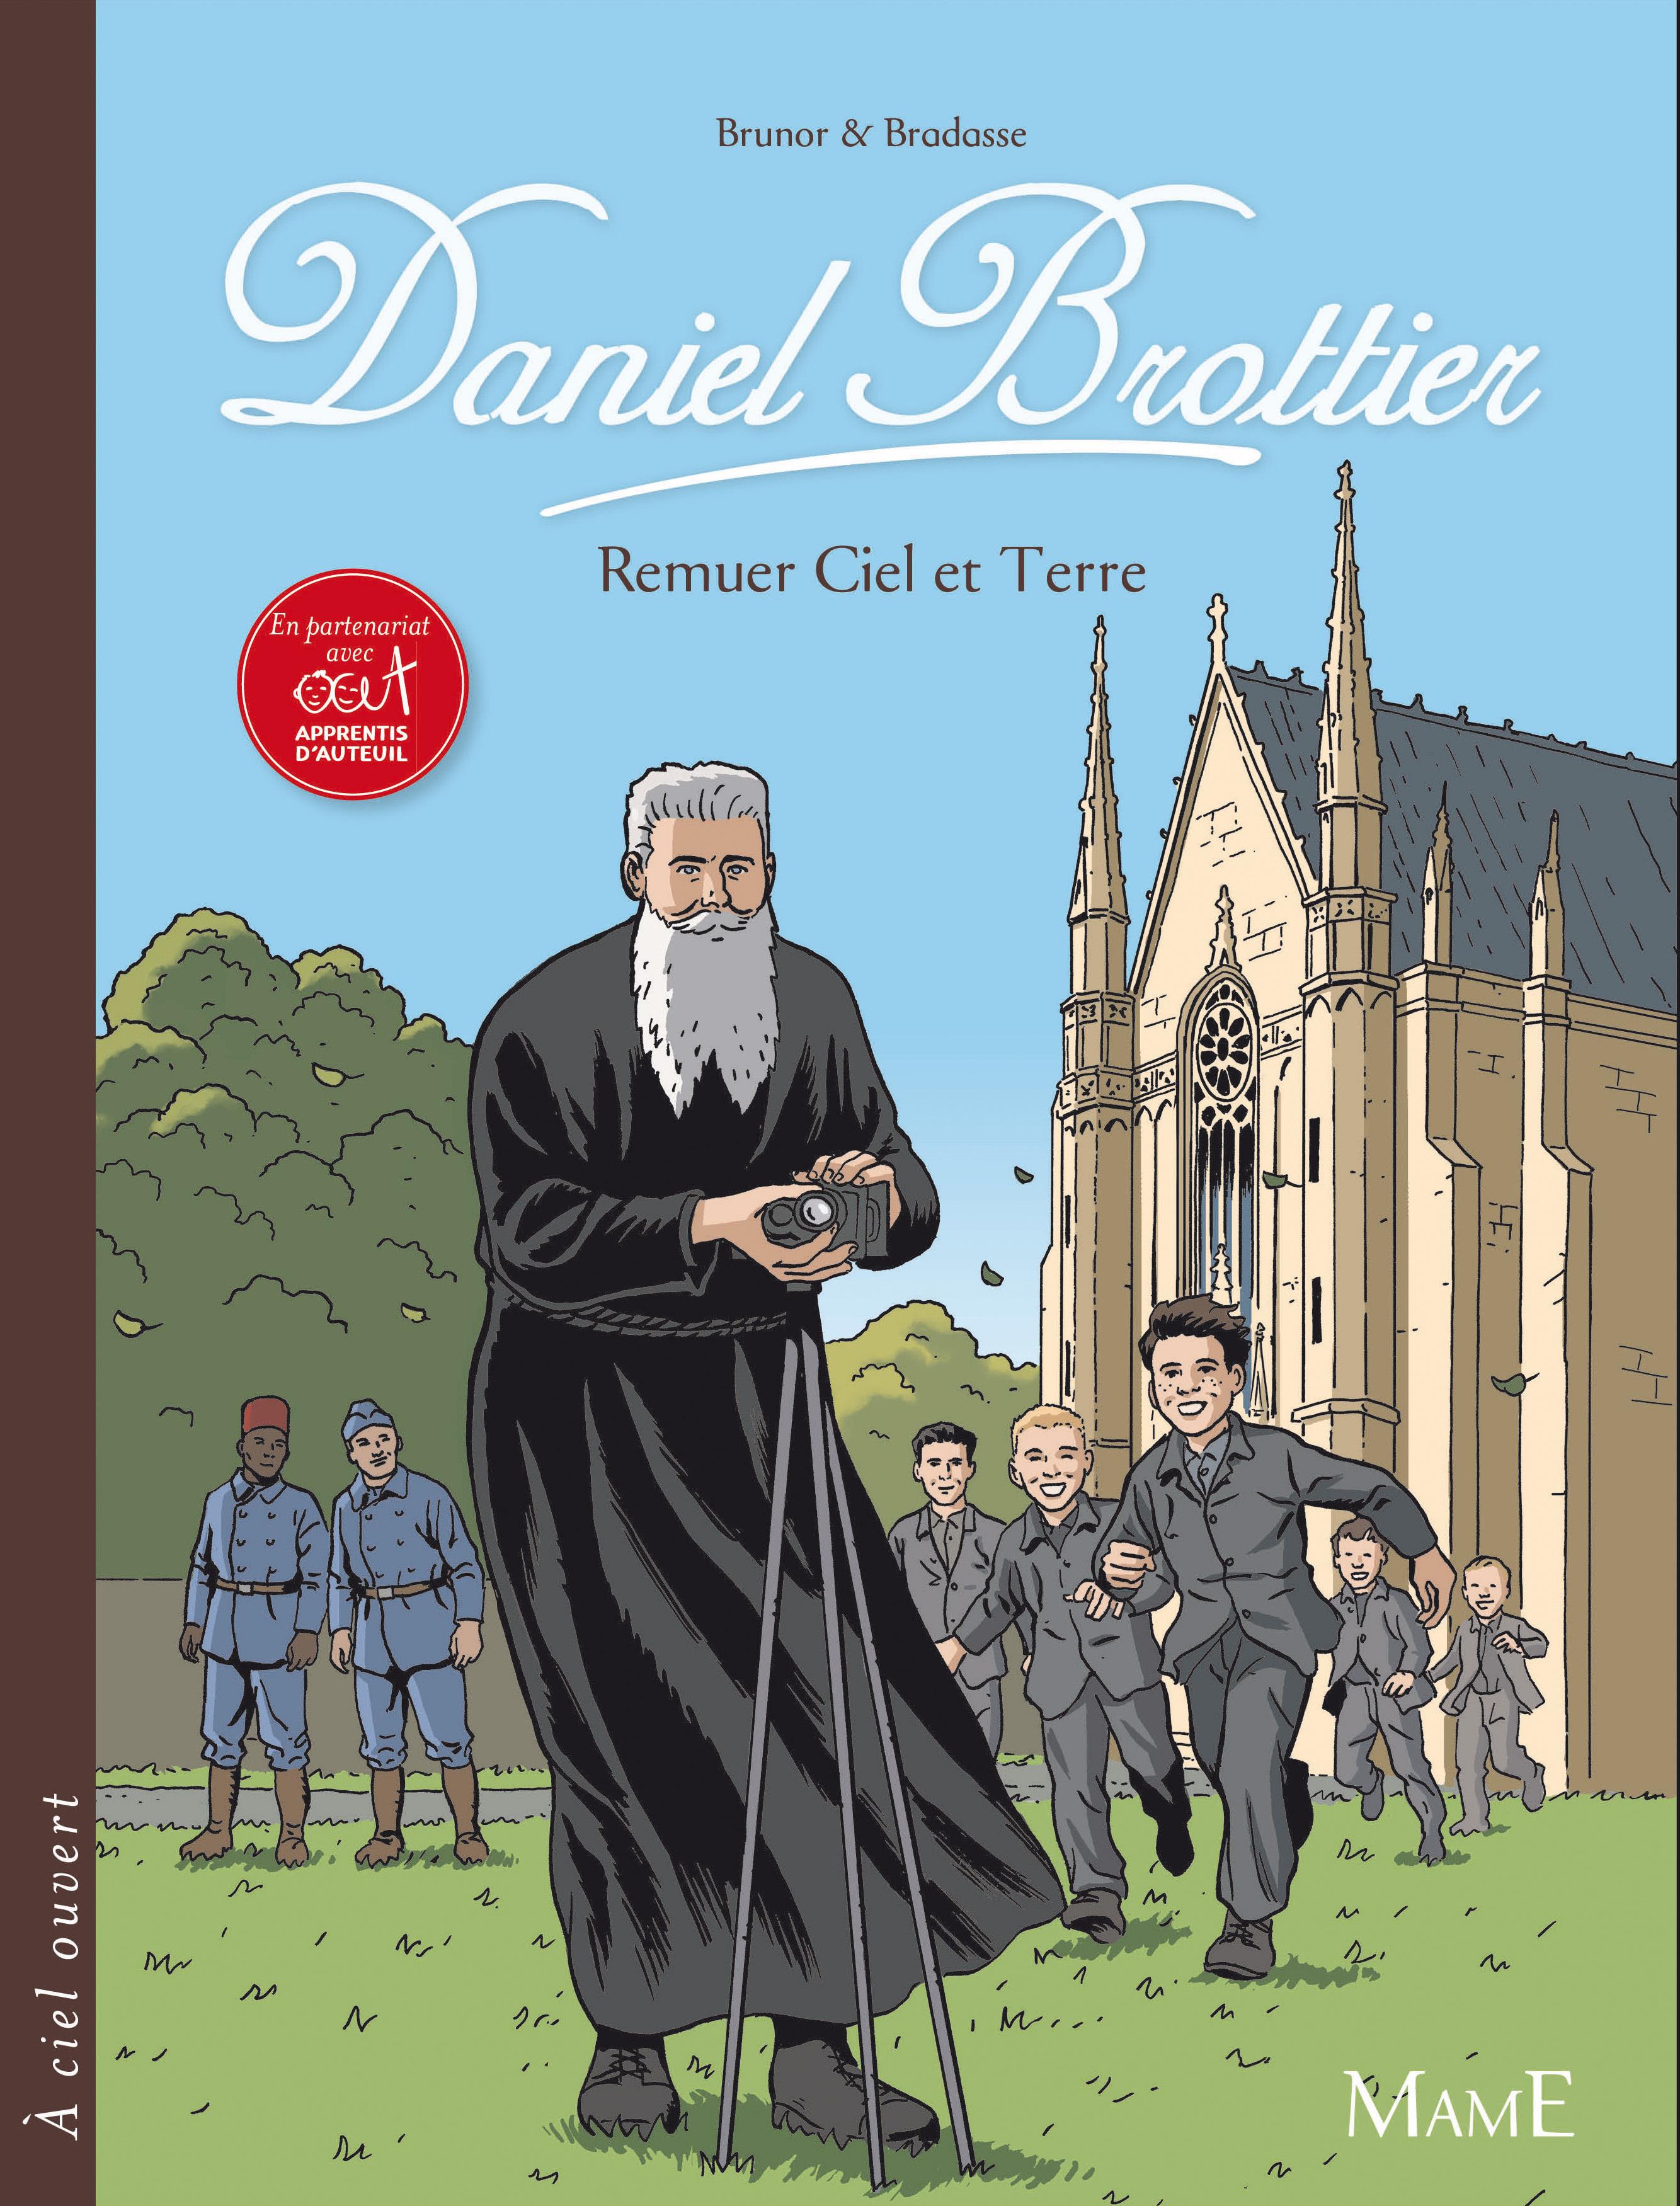 DANIEL BROTTIER, REMUER CIEL ET TERRE